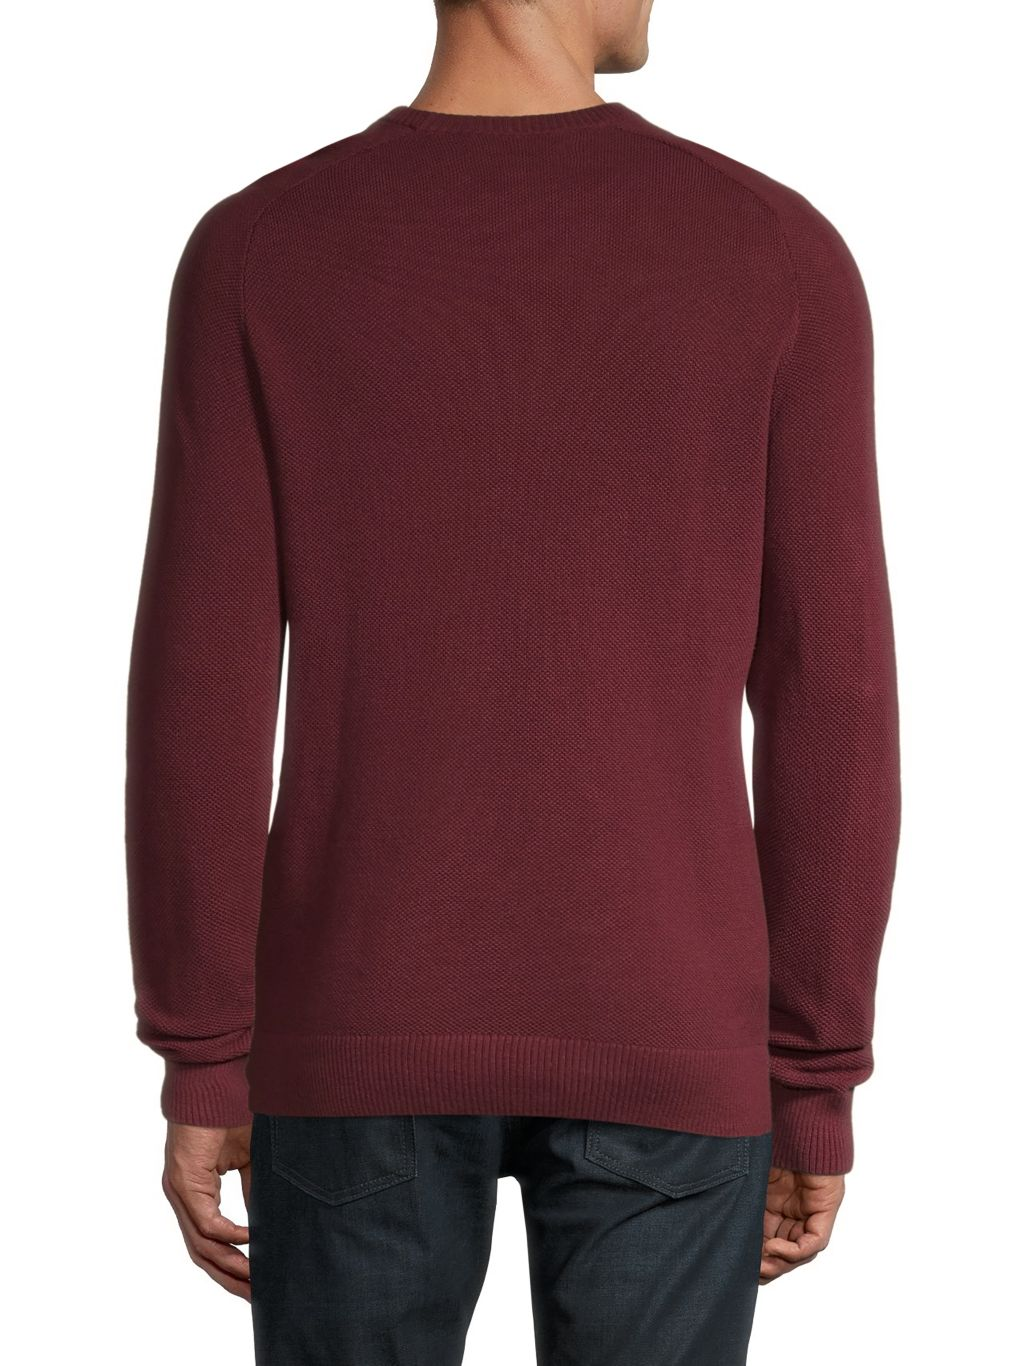 Original Penguin Crewneck Cotton Sweater